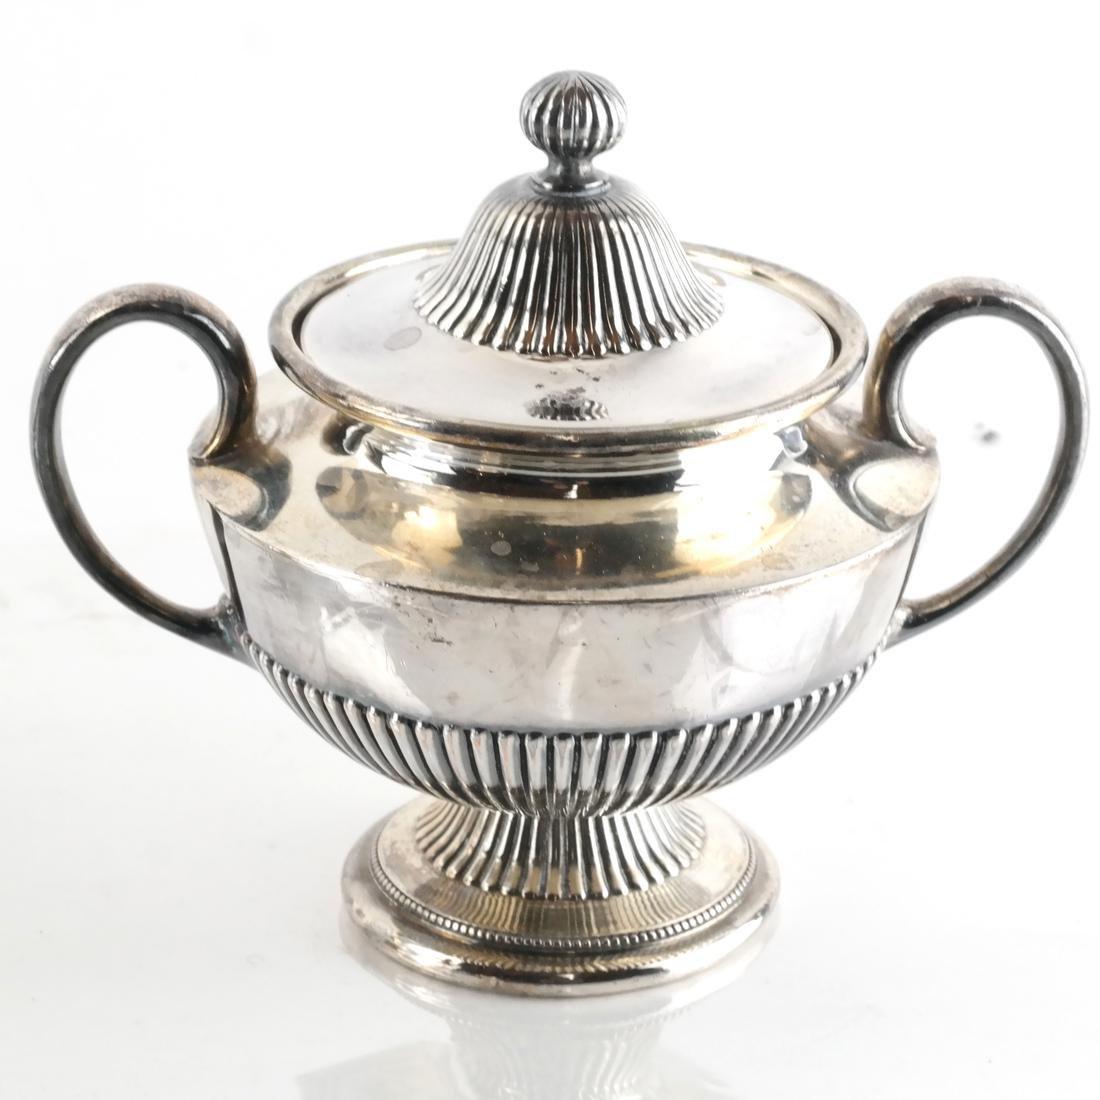 James Dixon & Sons, Silver Plate Tea Service - 5